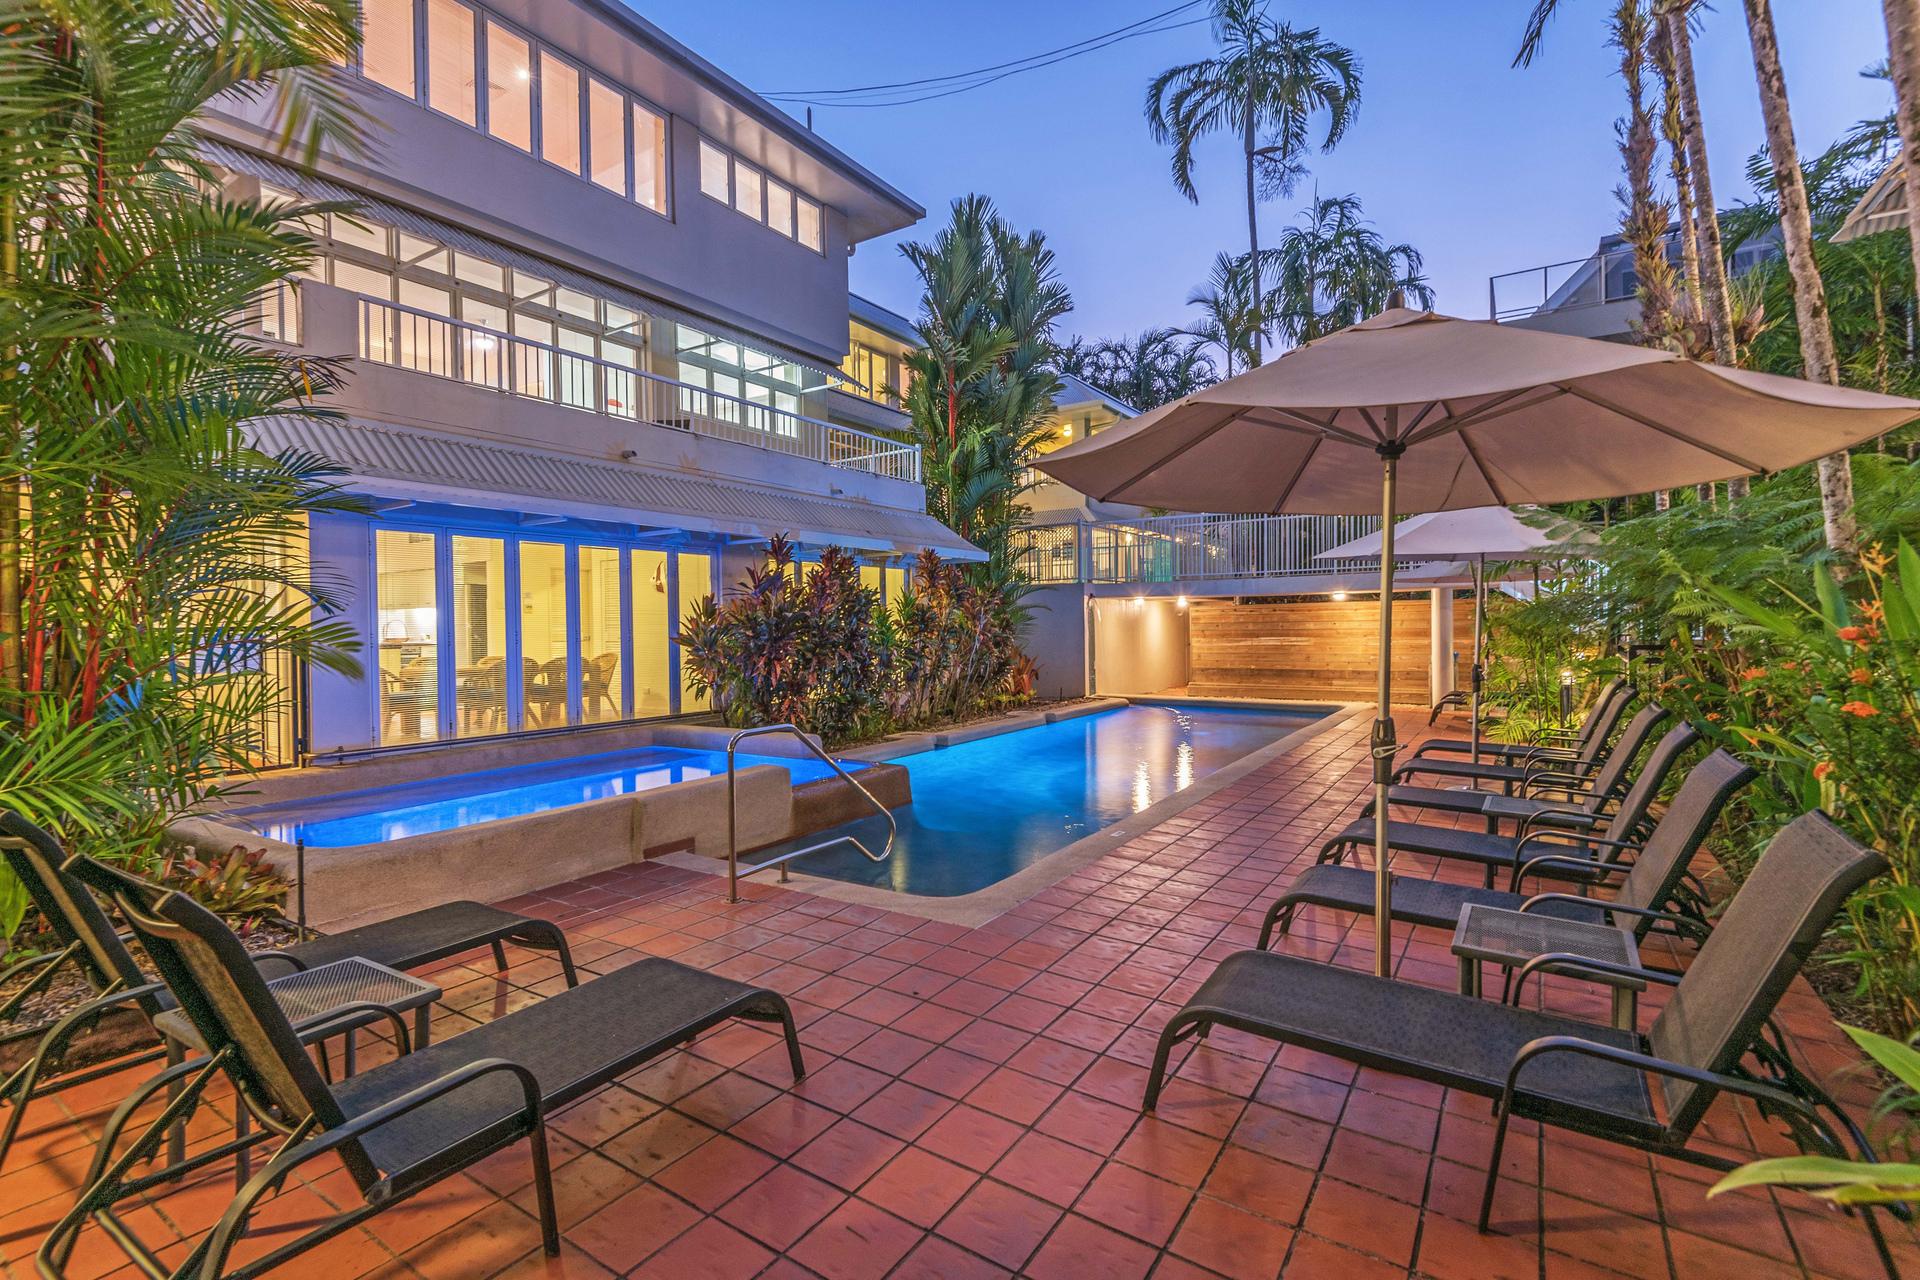 c - Balboa Apartments